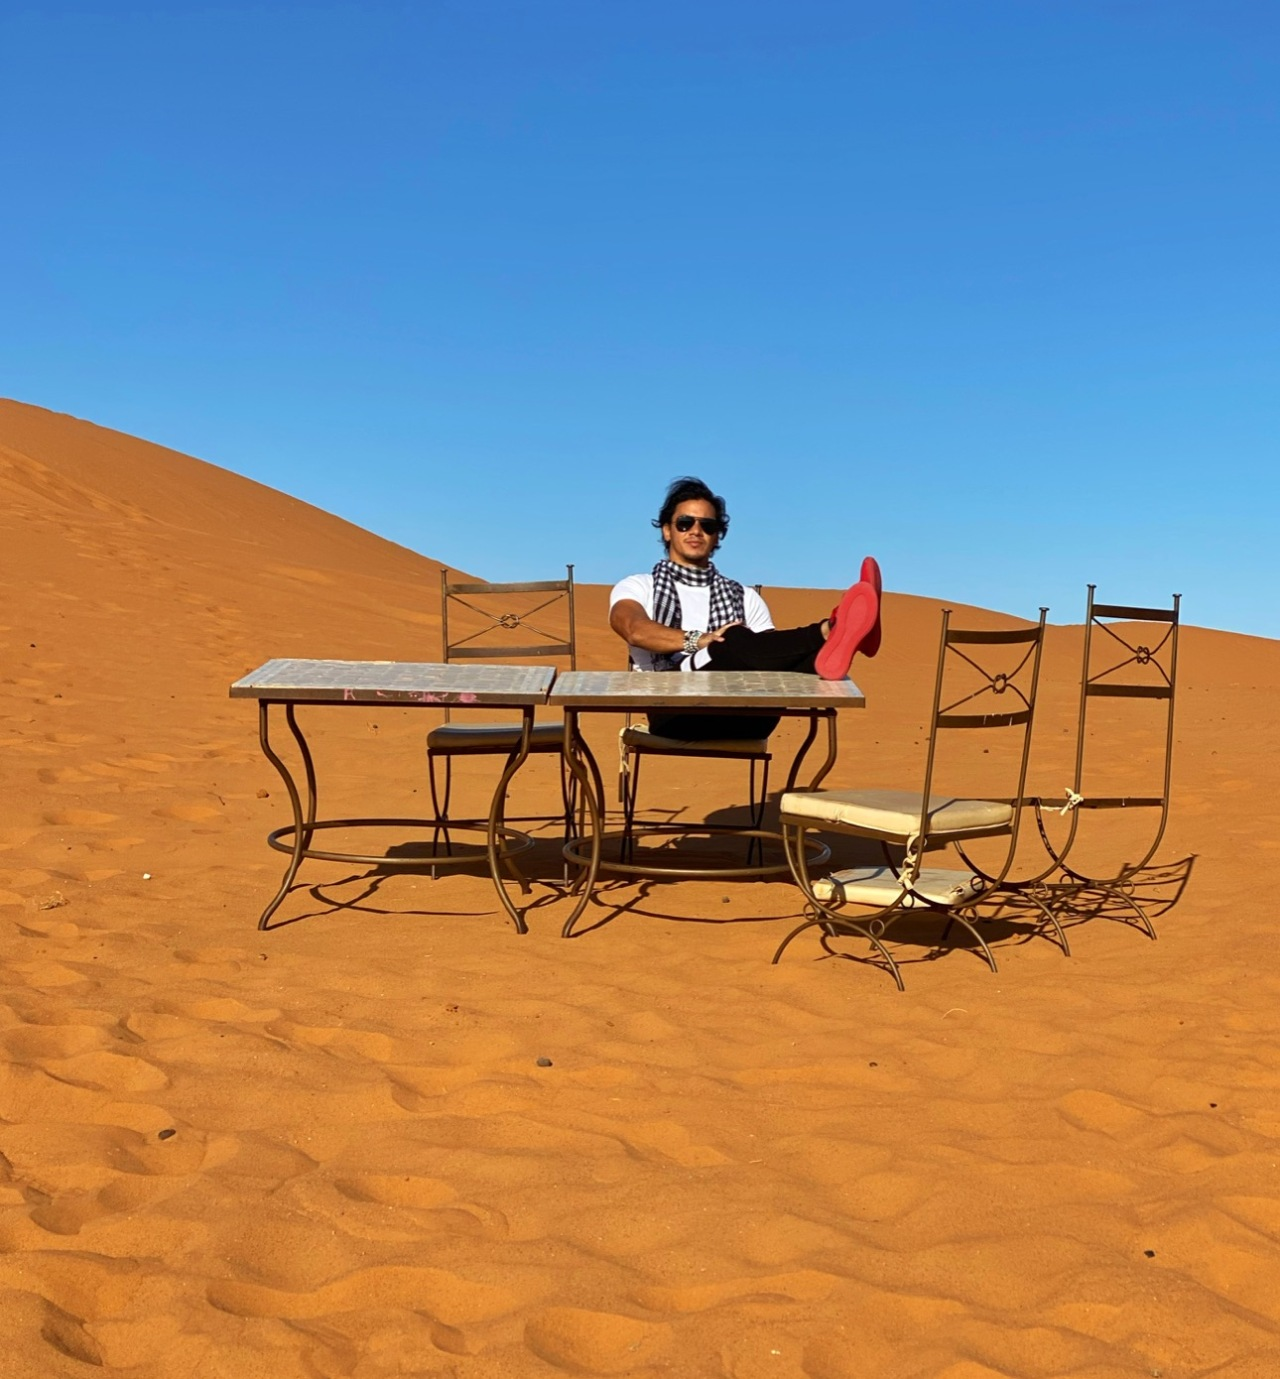 sahara desert pose